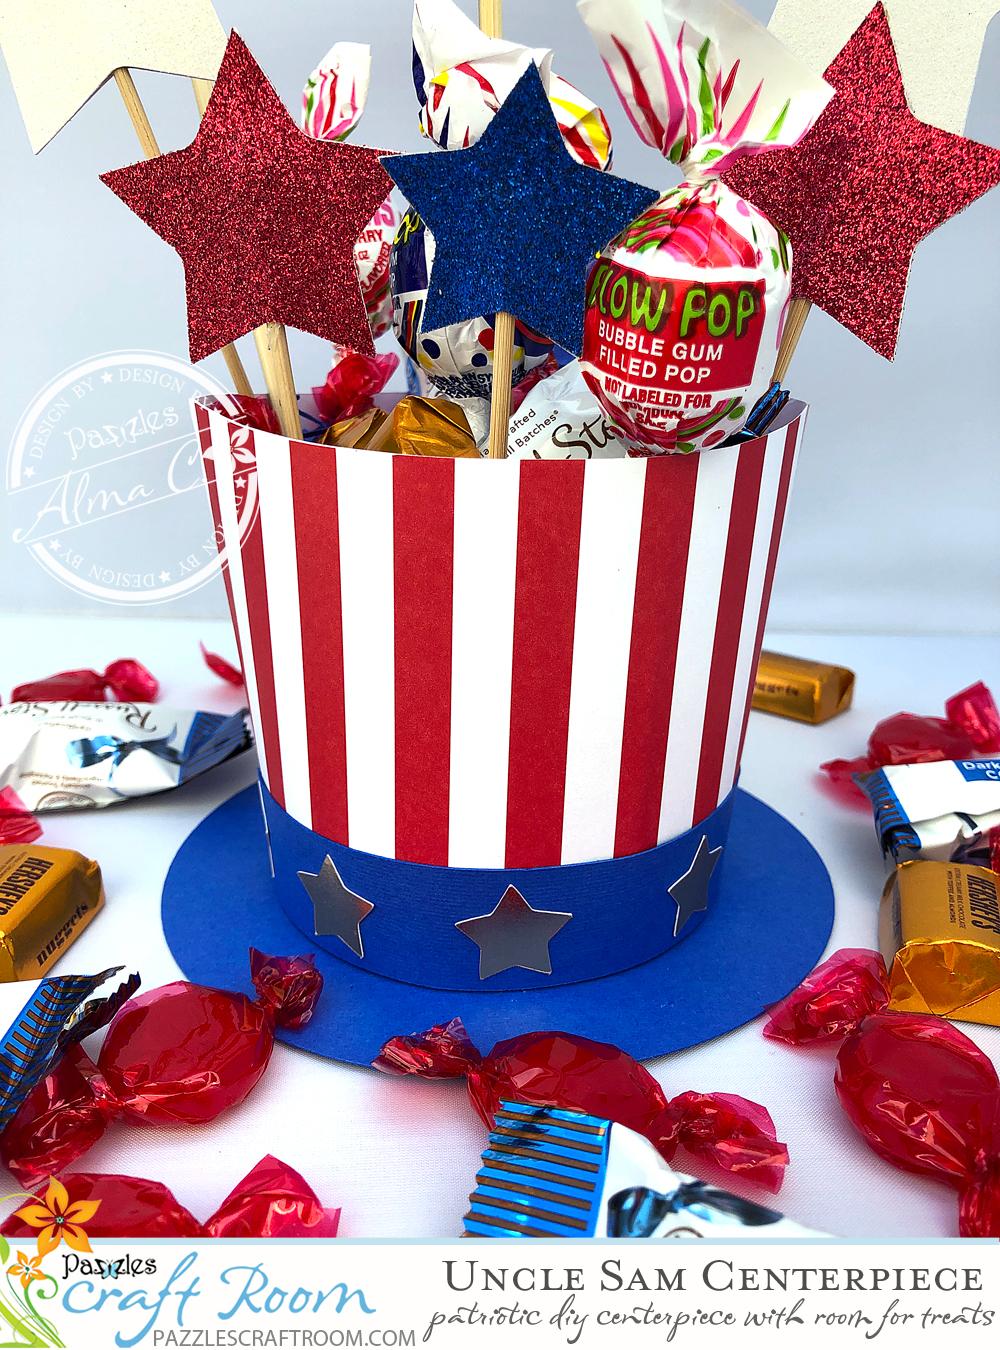 Uncle Sam Centerpiece Pazzles Craft Room